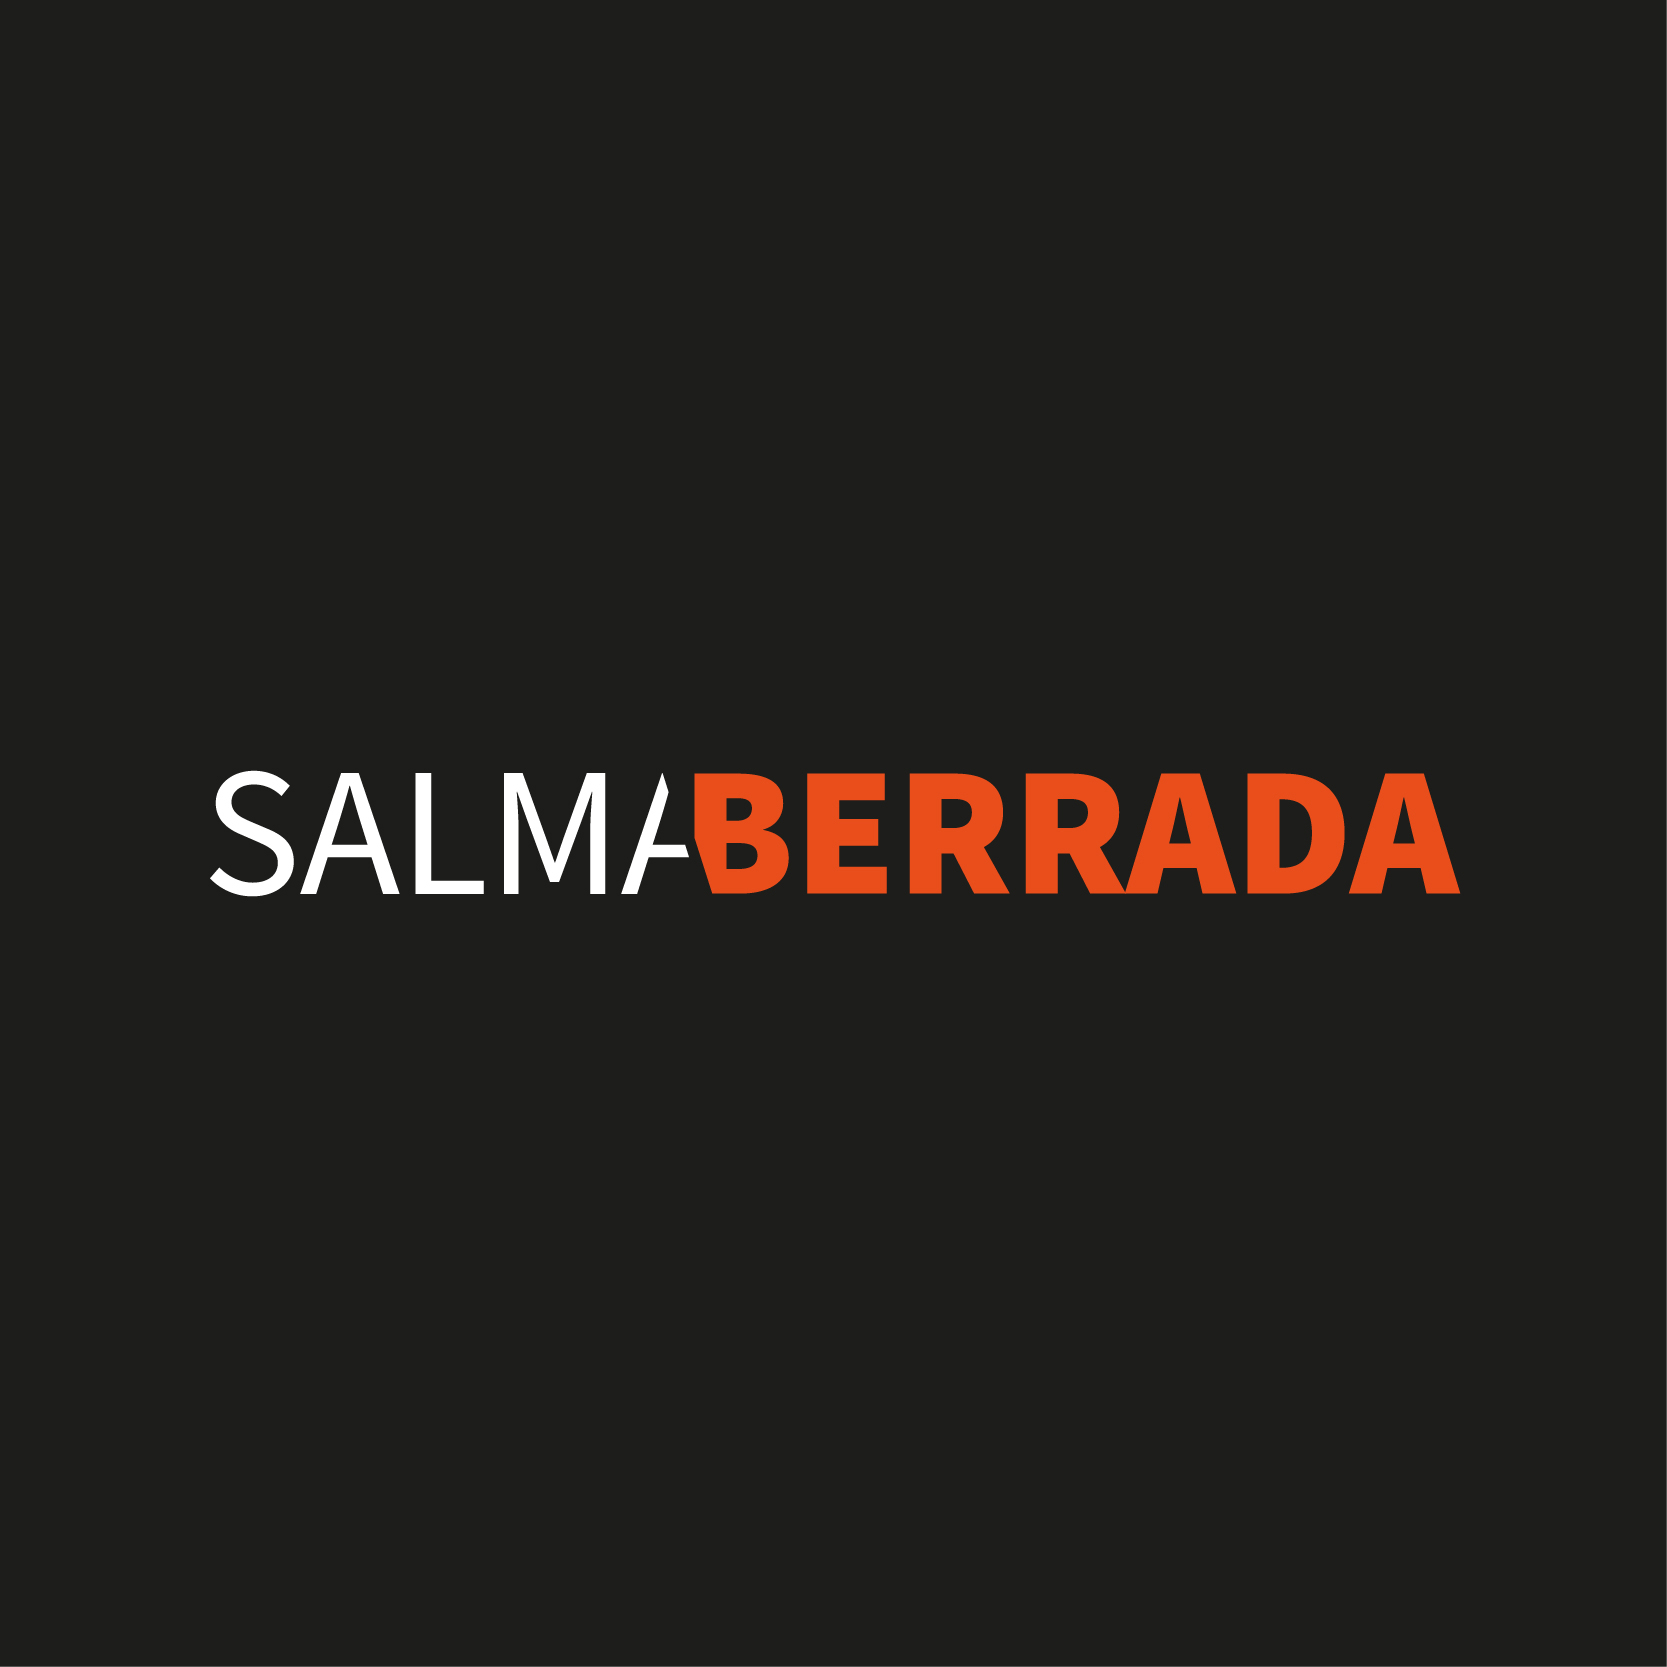 logo_Salma_negatif_bi-color_light